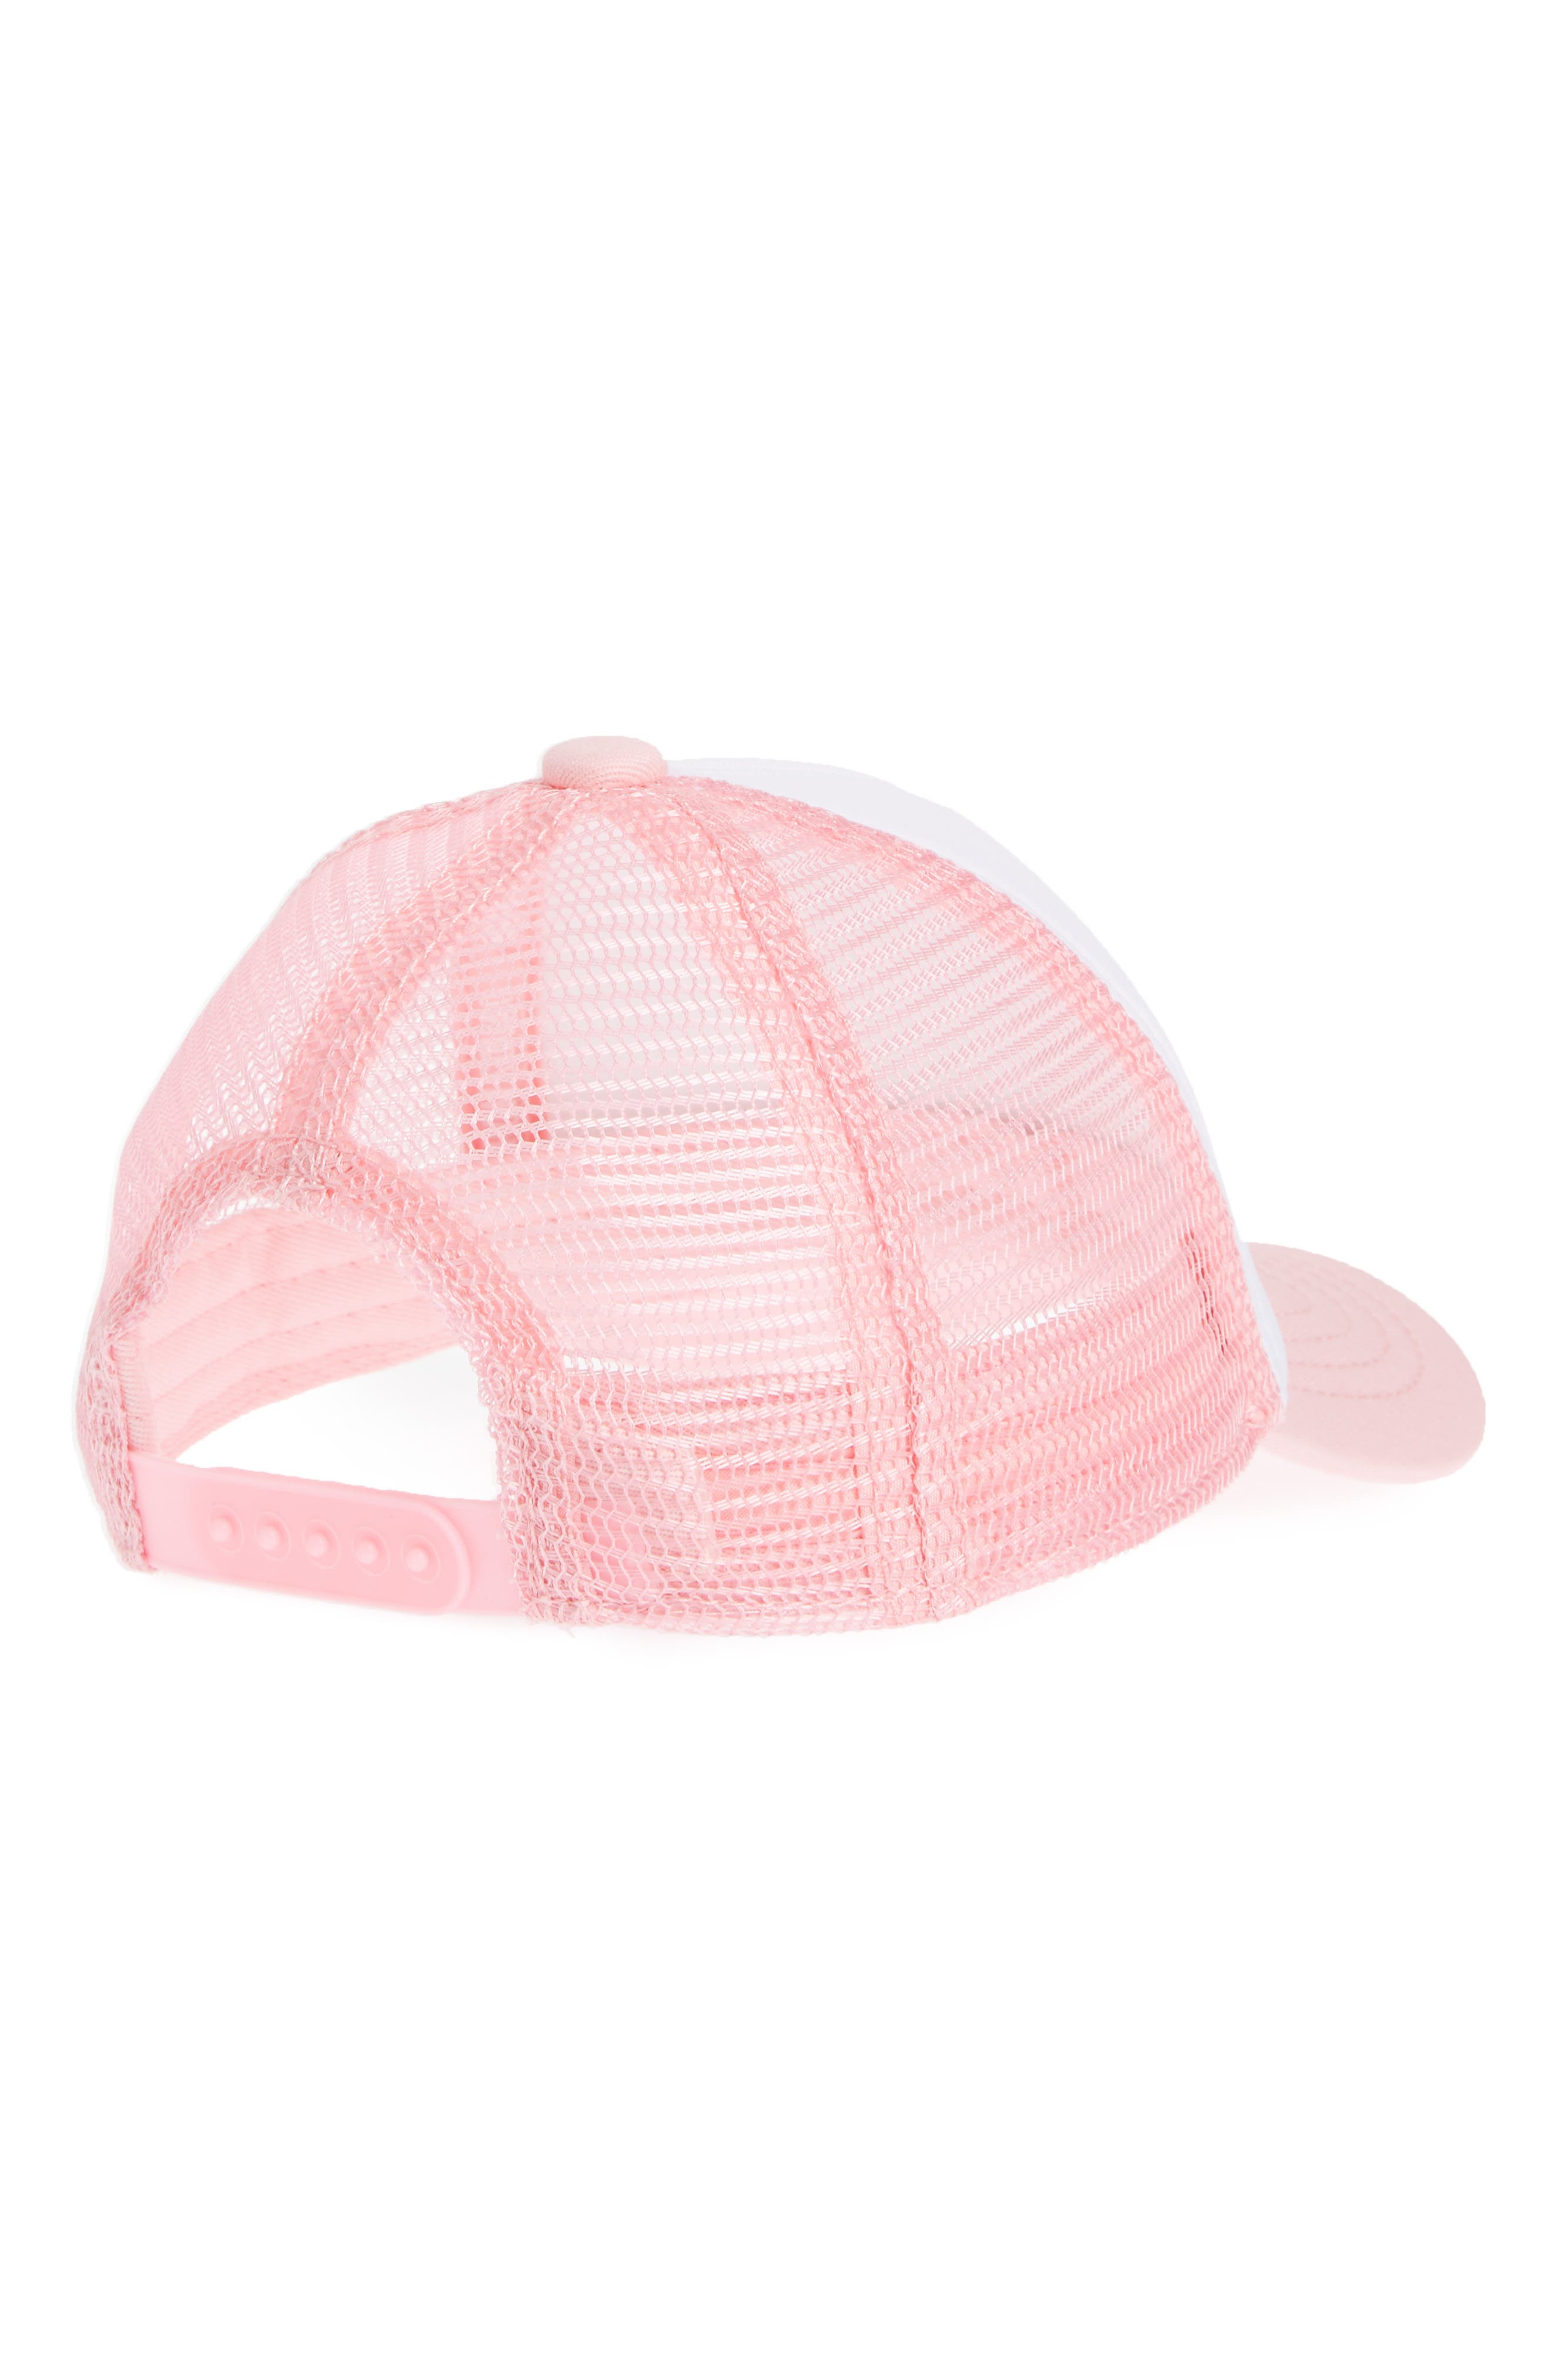 Trucker Hat,                             Alternate thumbnail 2, color,                             BUSIN DAISY